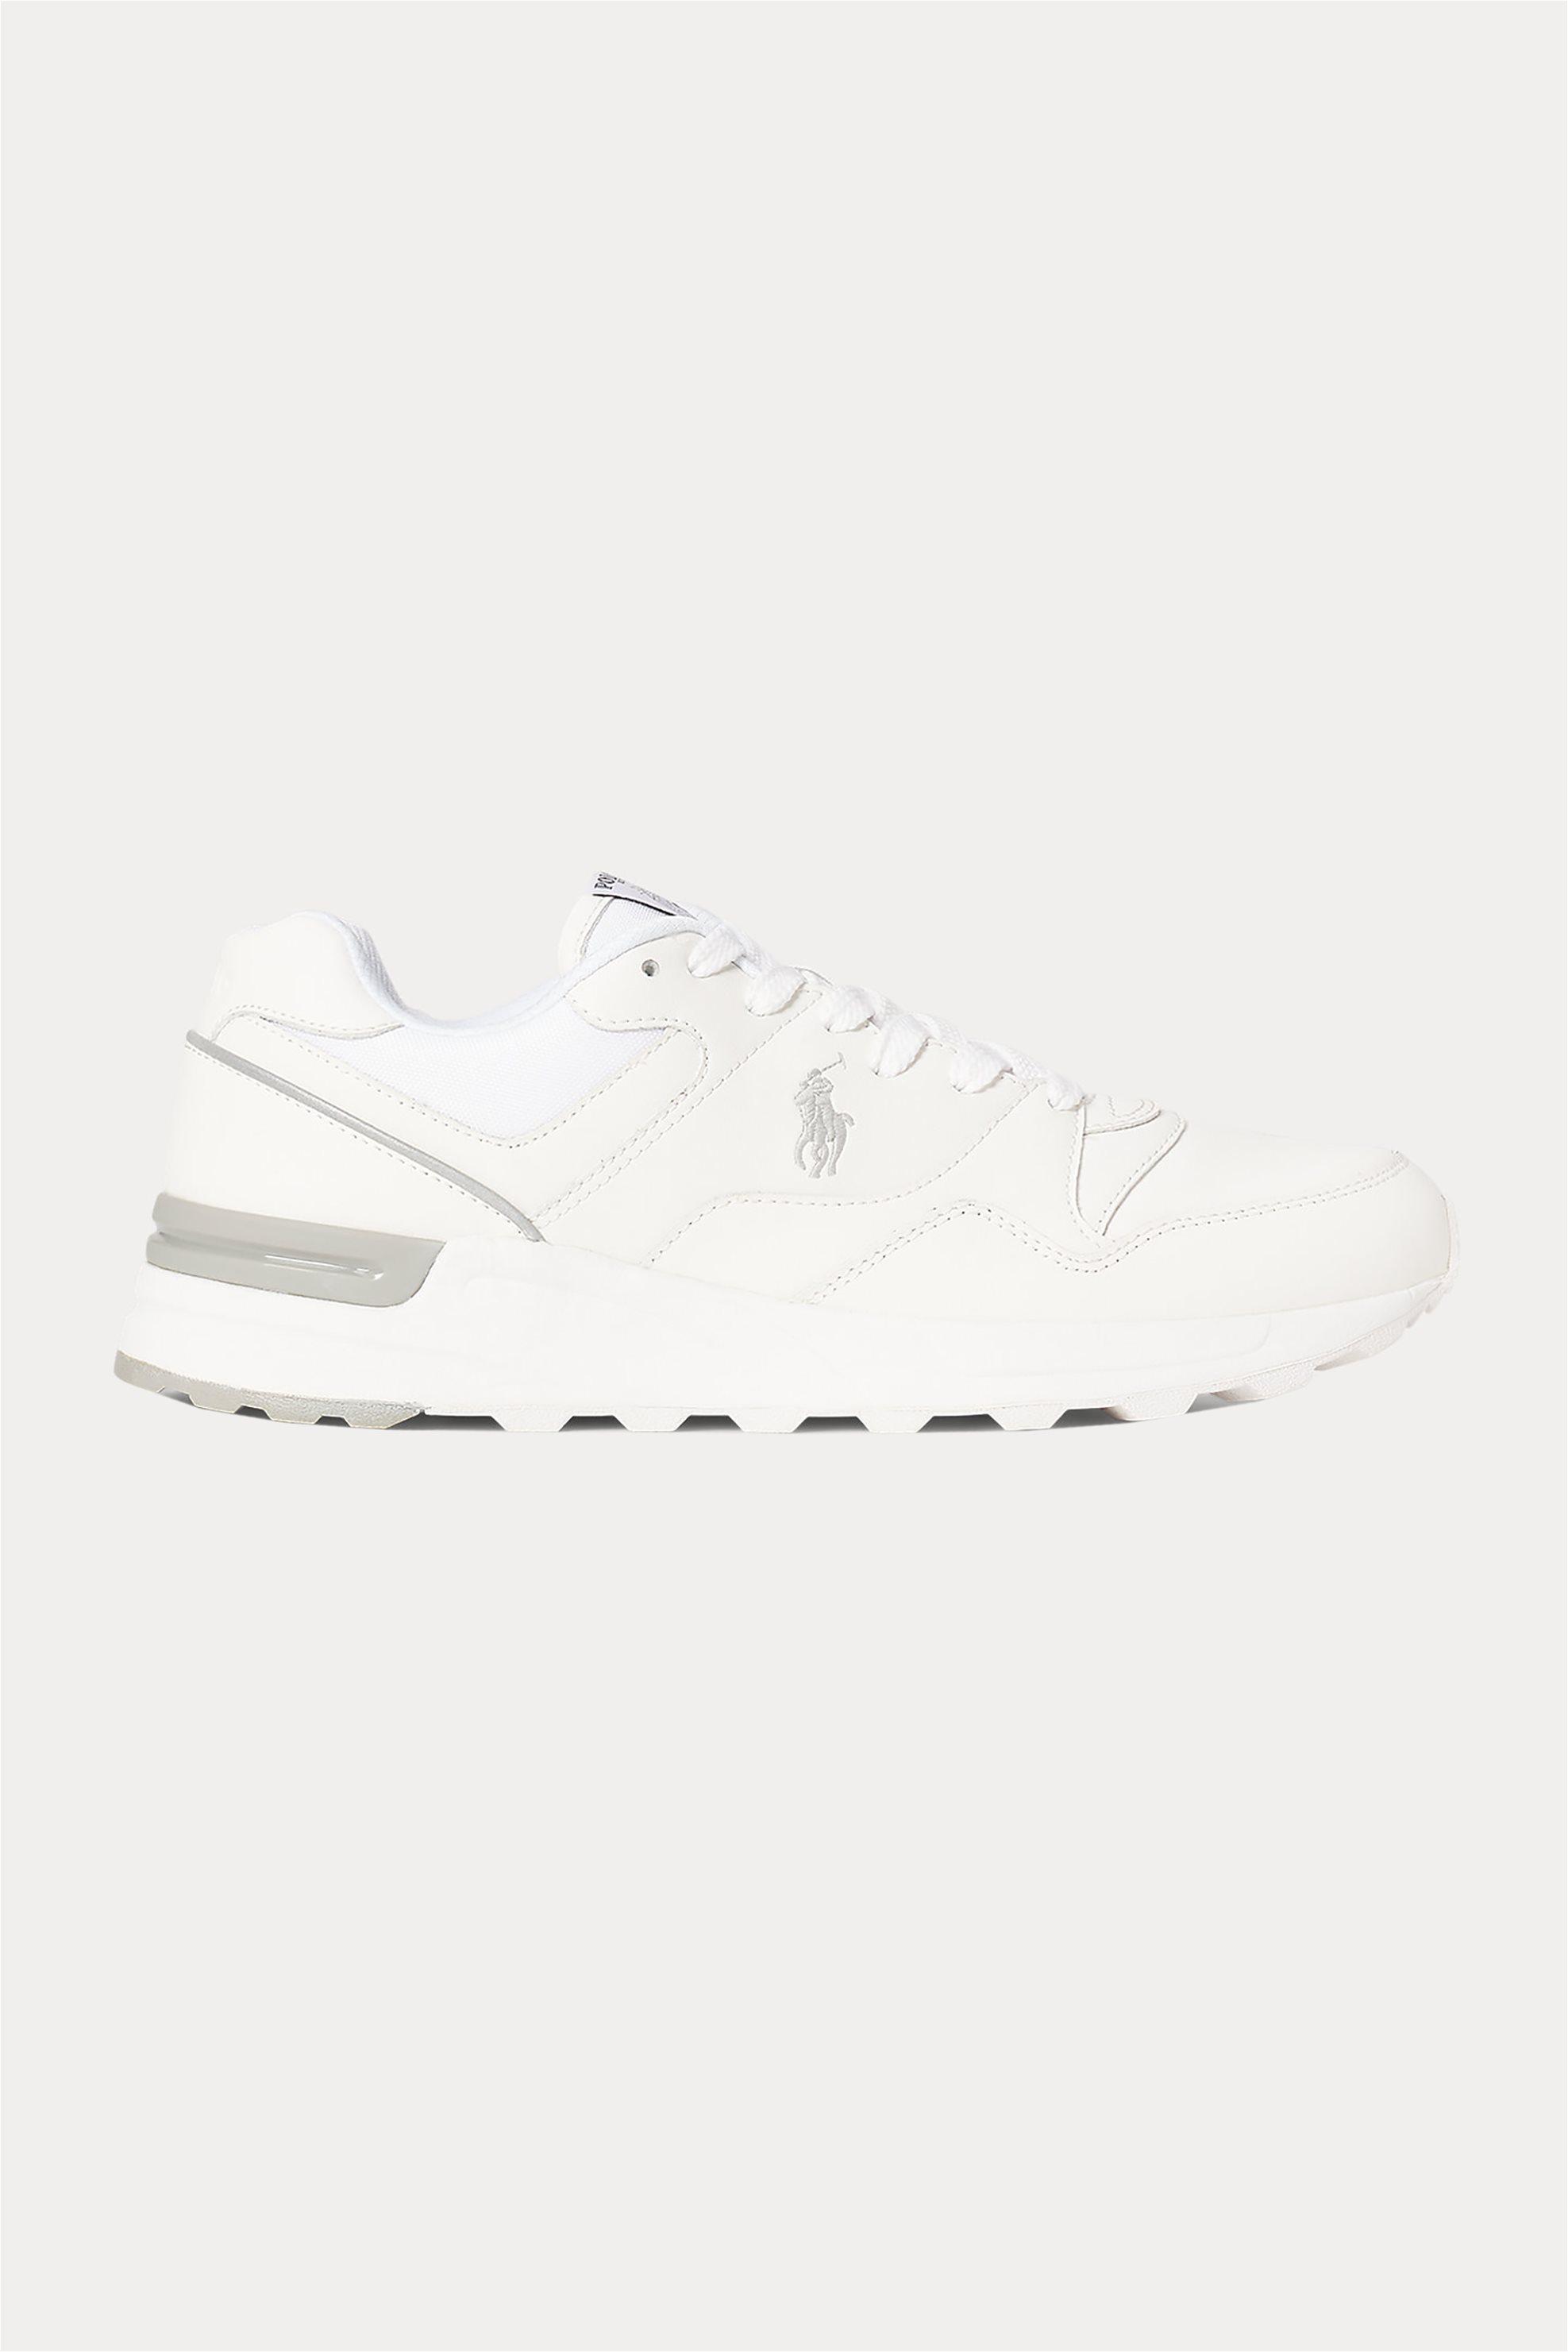 "Polo Ralph Lauren ανδρικά δερμάτινα trainers με κορδόνια ""Trackster 100"" – 809806303002 – Λευκό"